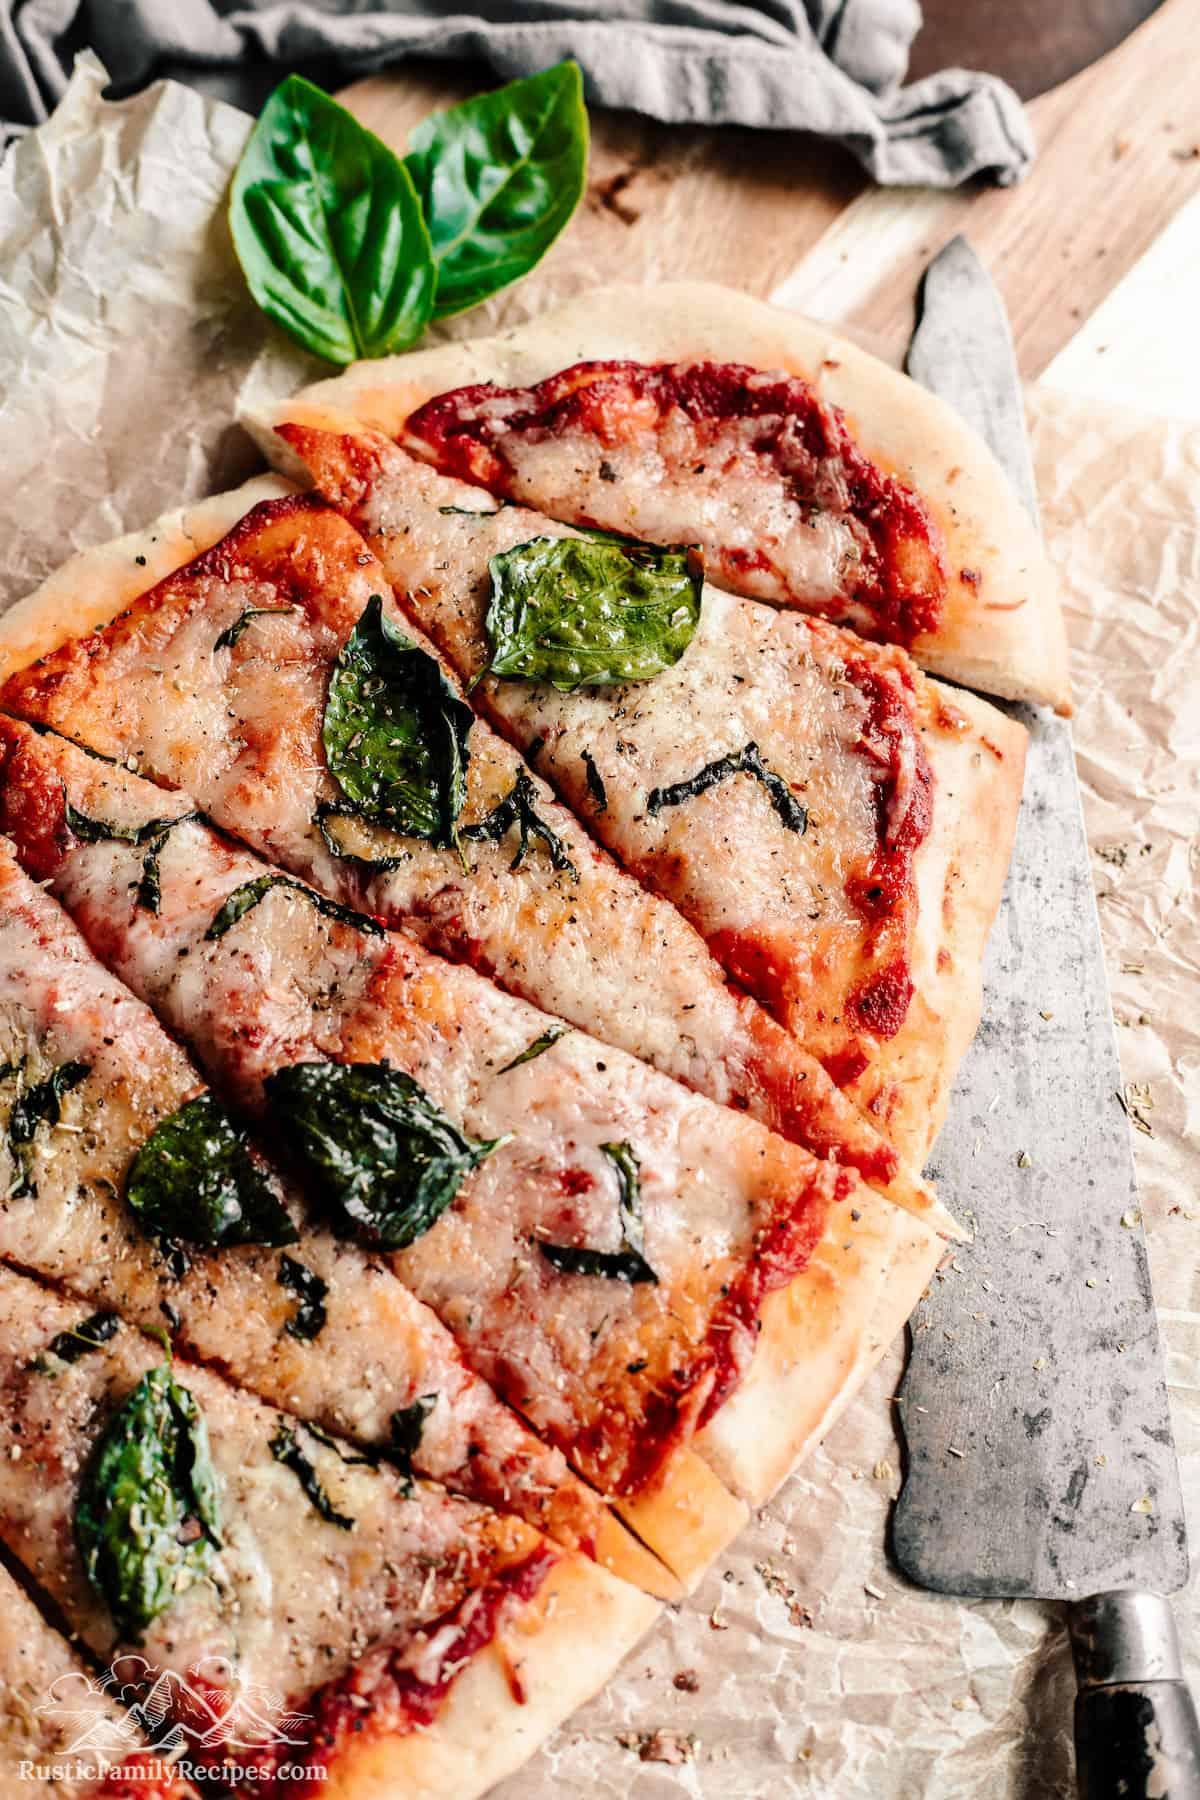 Sliced sourdough pizza